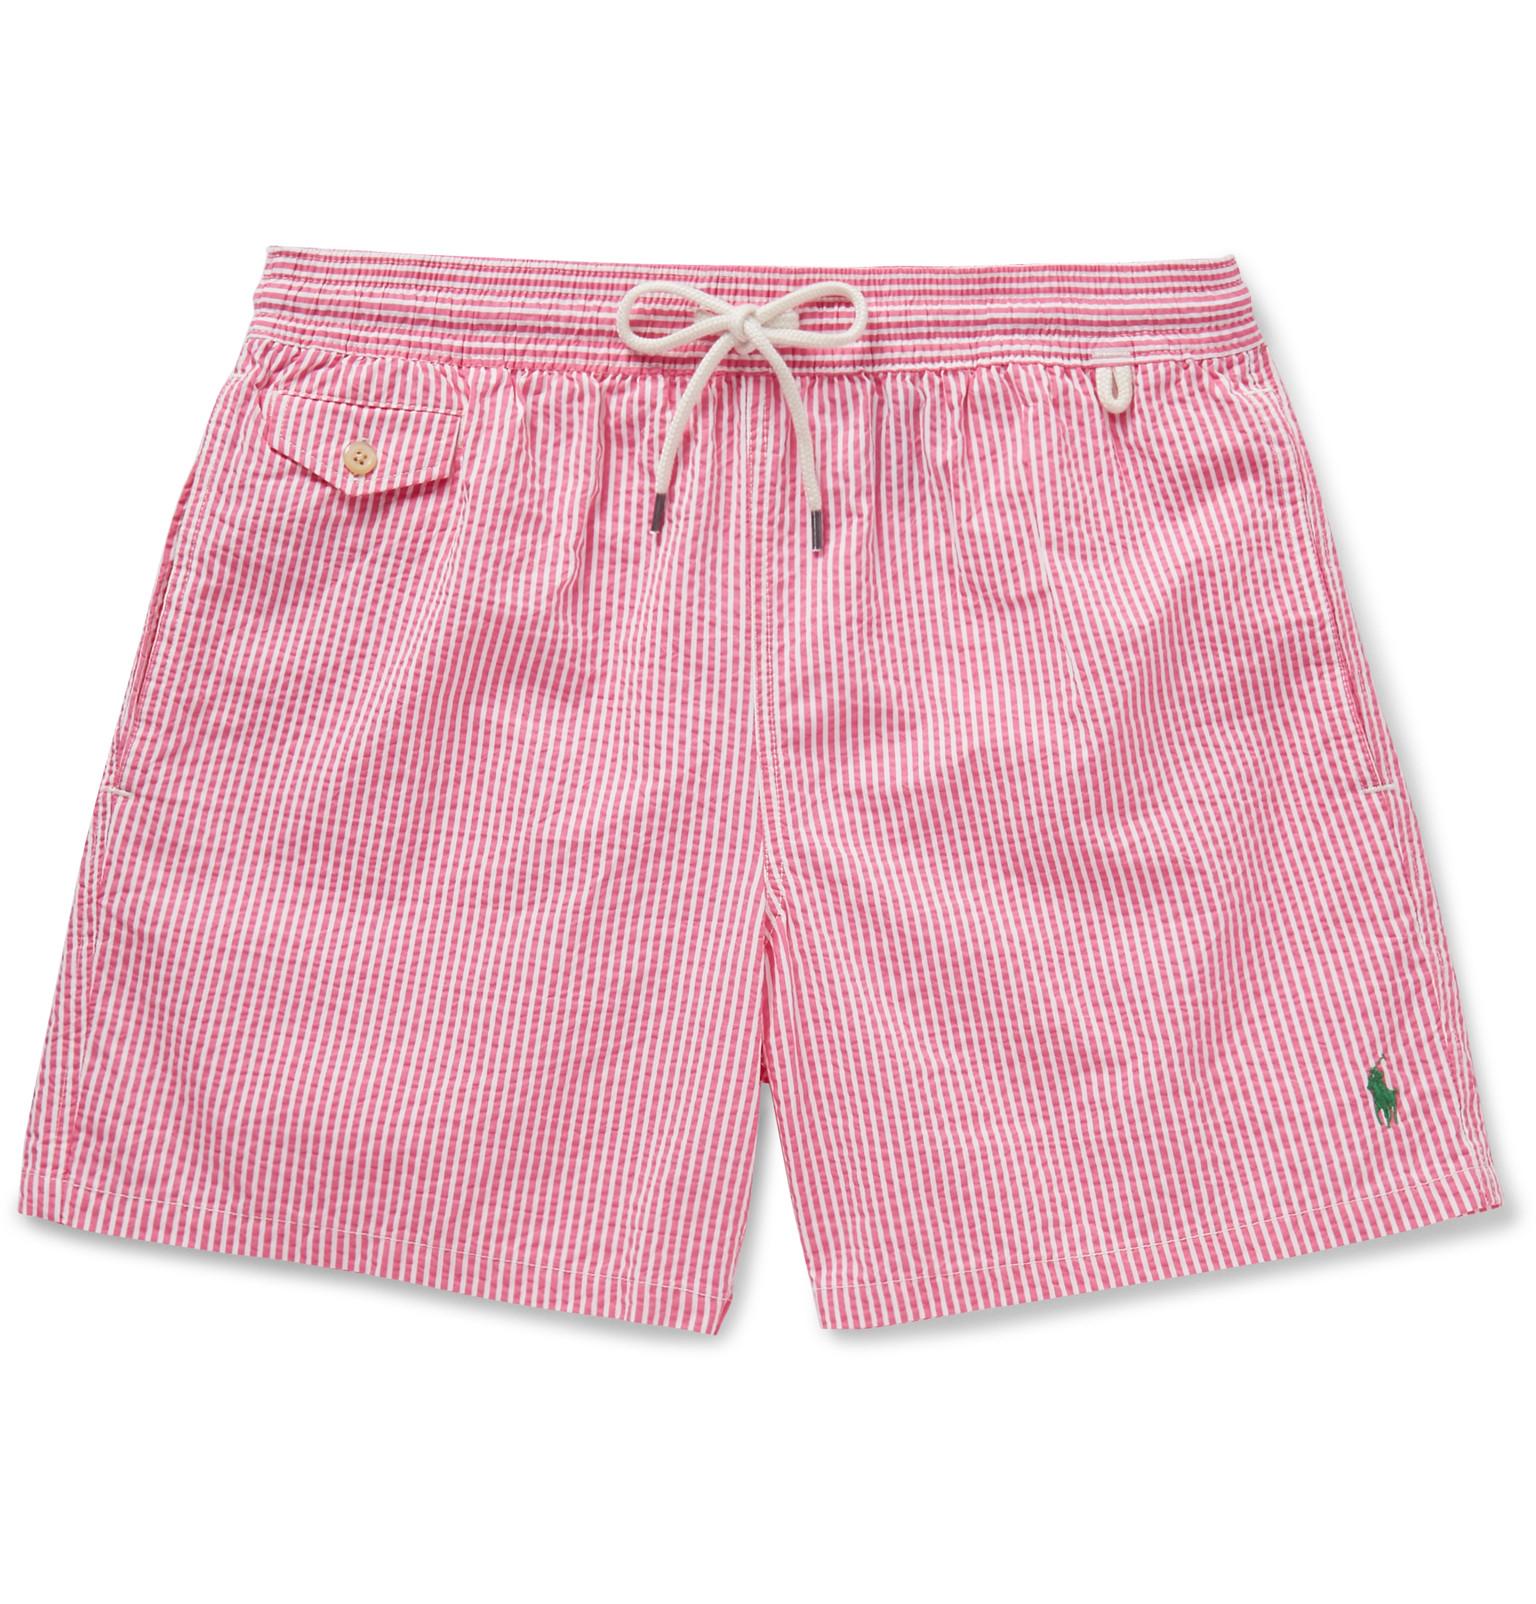 b0cee25906 ... closeout polo ralph lauren traveler striped seersucker swim shorts in  pink d17d8 ed35c ...